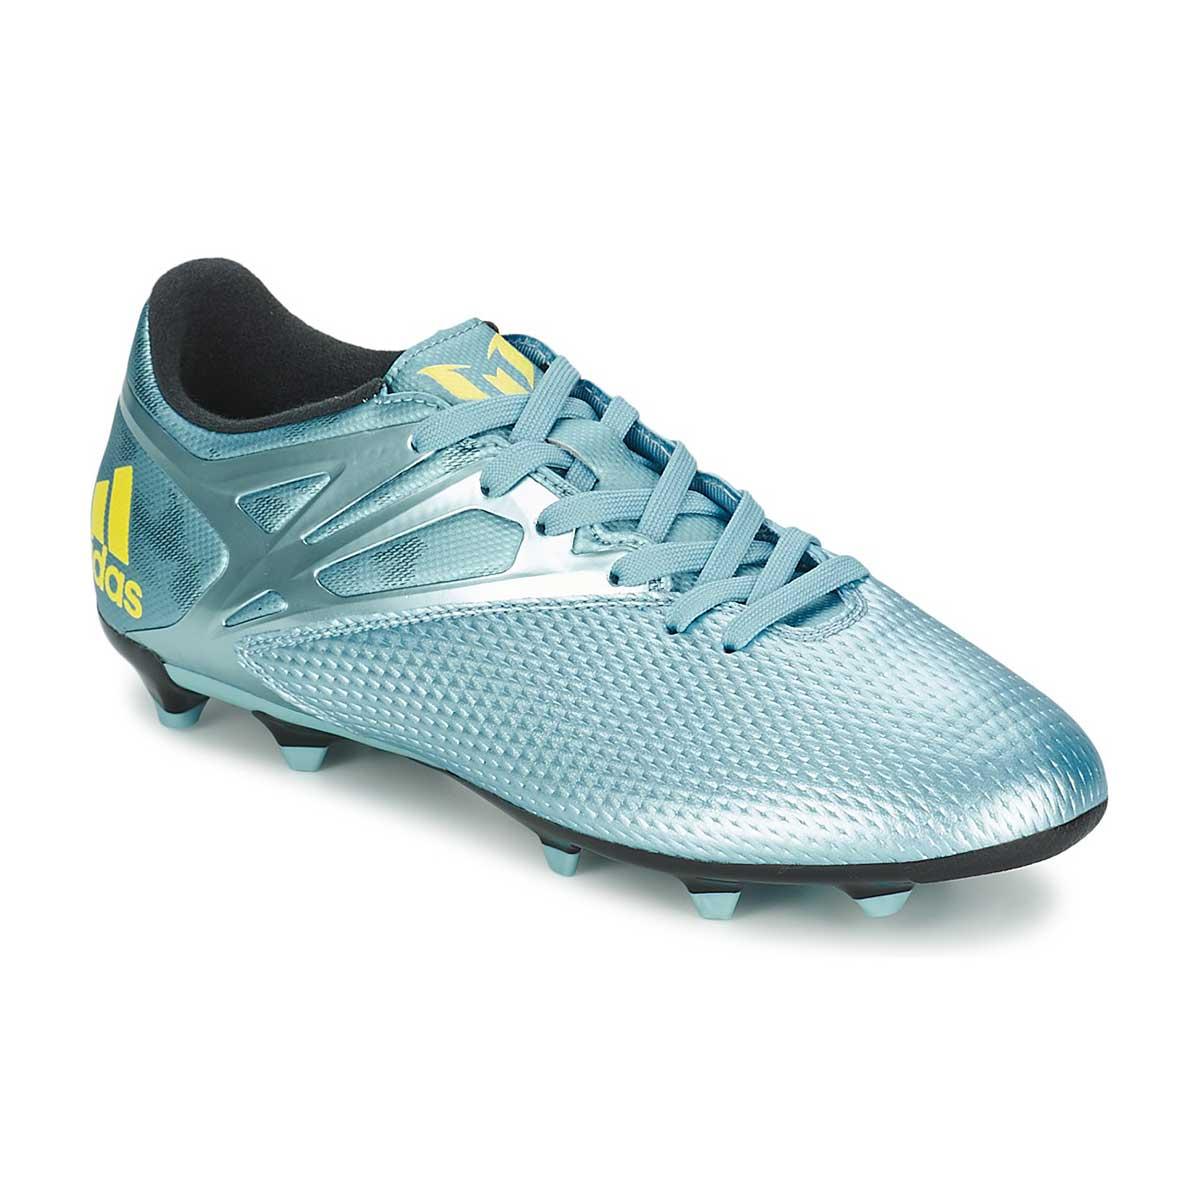 Football Shoes, Football, Sports, Buy, Adidas, Adidas Messi 15.3 FG/AG  Football Shoes , ,